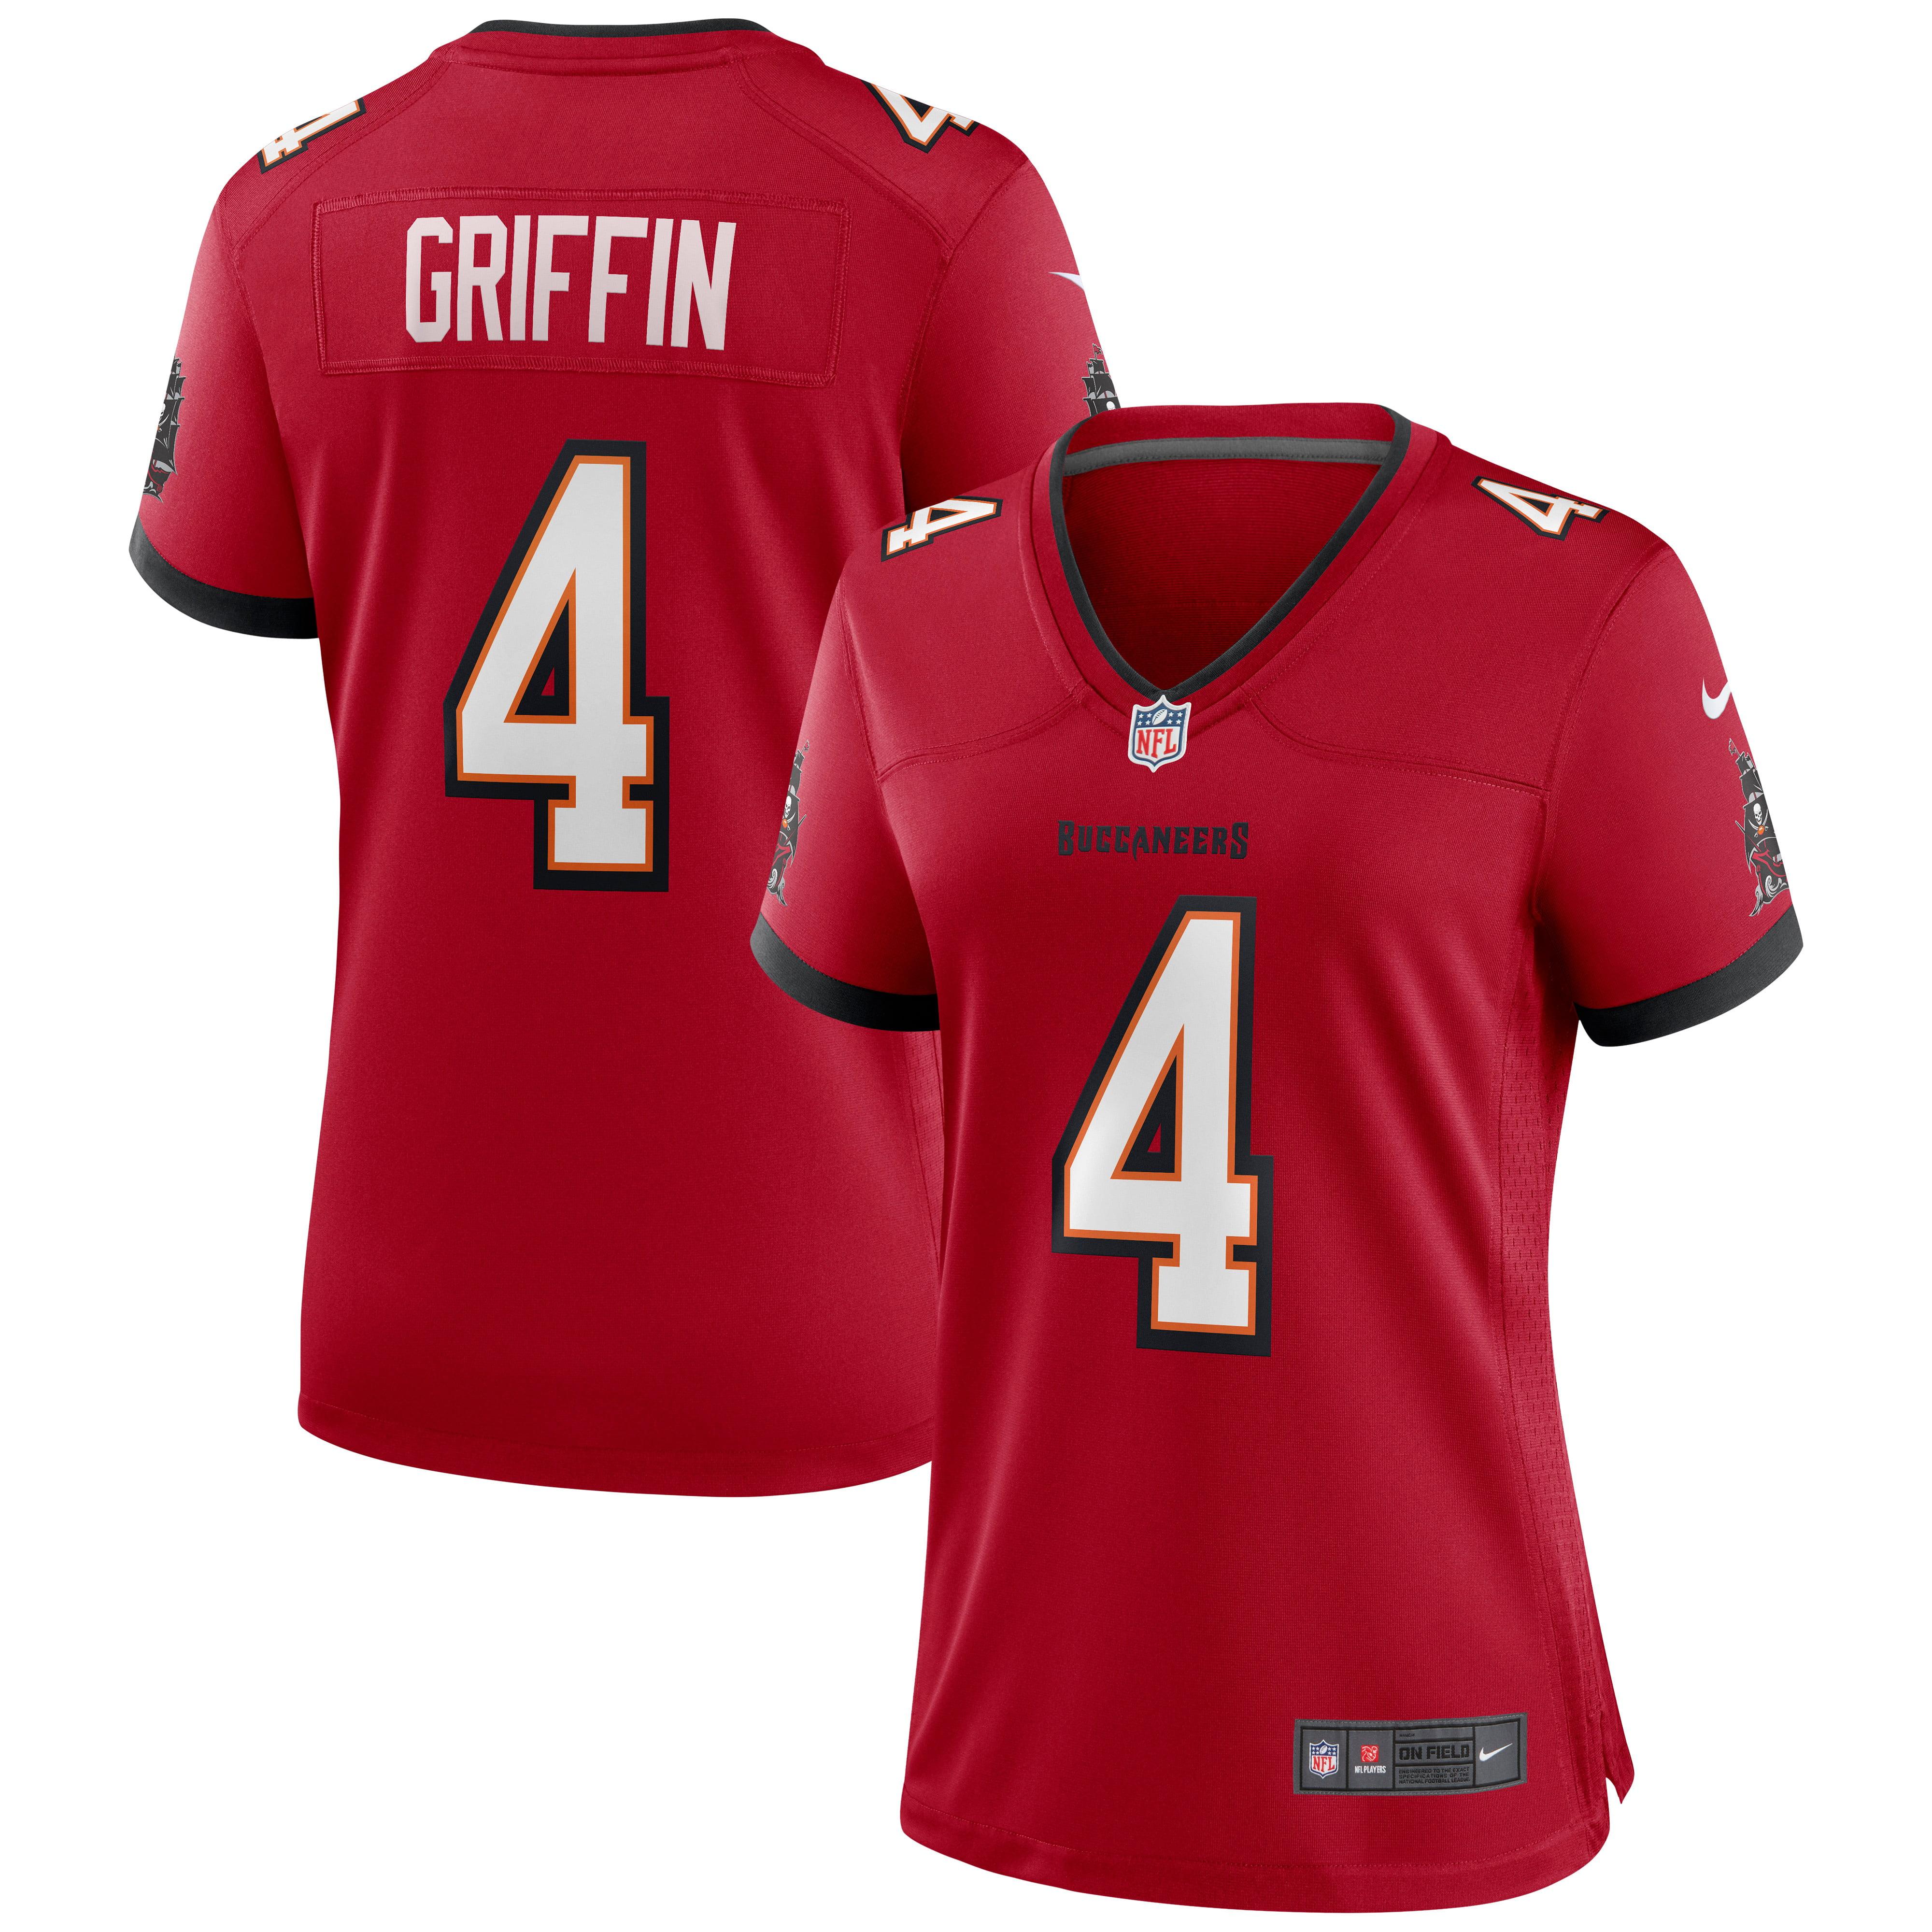 Ryan Griffin Tampa Bay Buccaneers Nike Women's Game Jersey - Red - Walmart.com